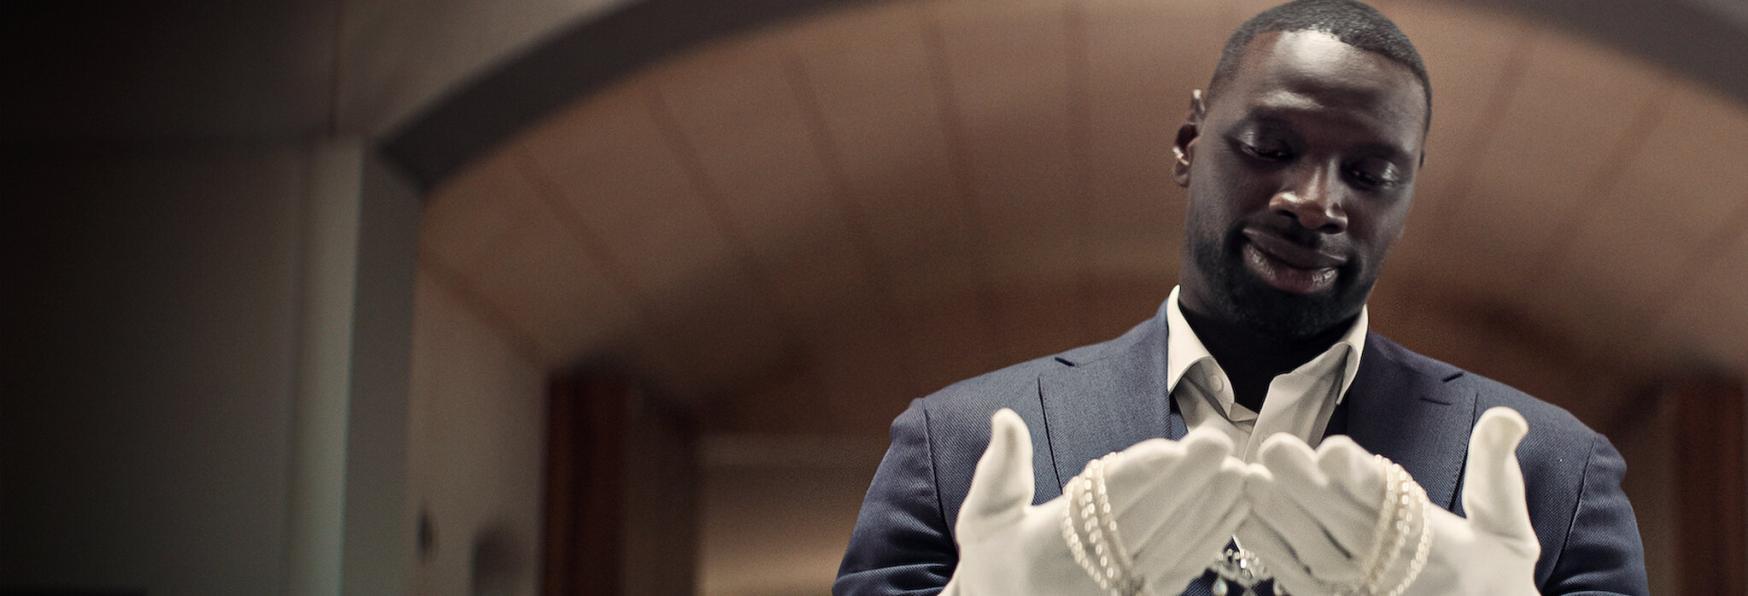 Lupin: la nuova Serie TV Francese è un Successo Globale